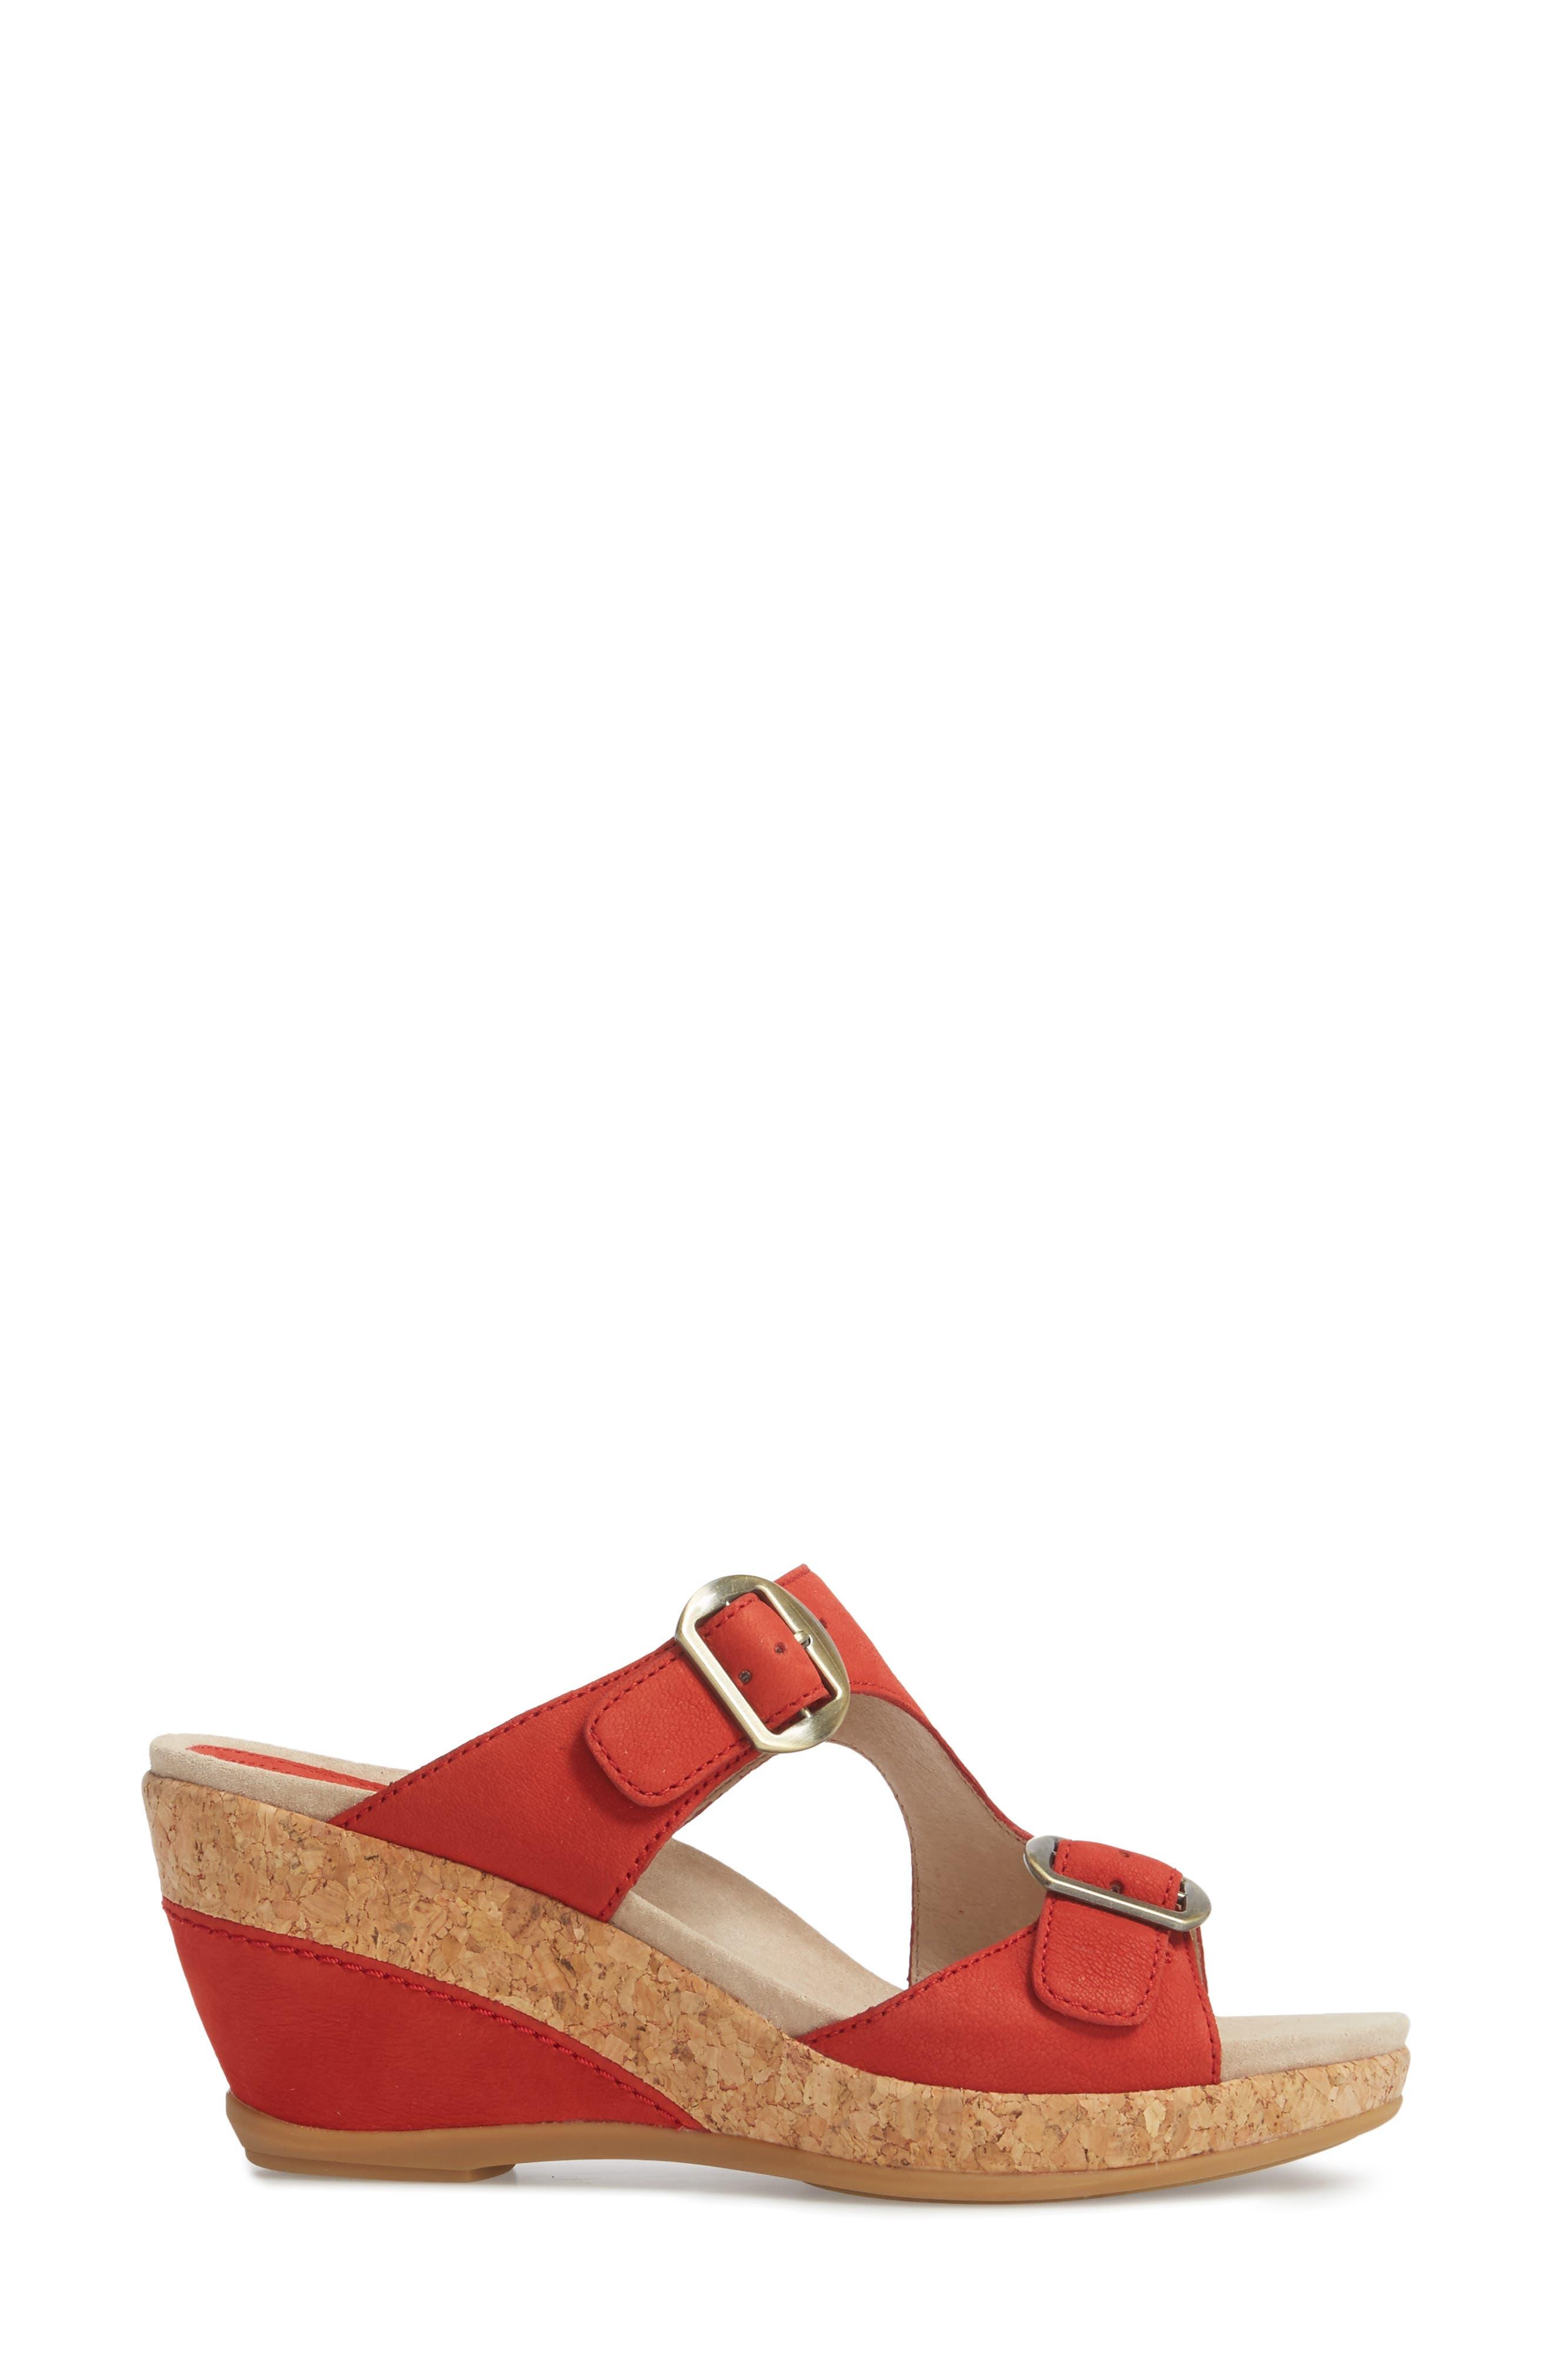 Carla Wedge Slide Sandal,                             Alternate thumbnail 3, color,                             Tomato Milled Nubuck Leather